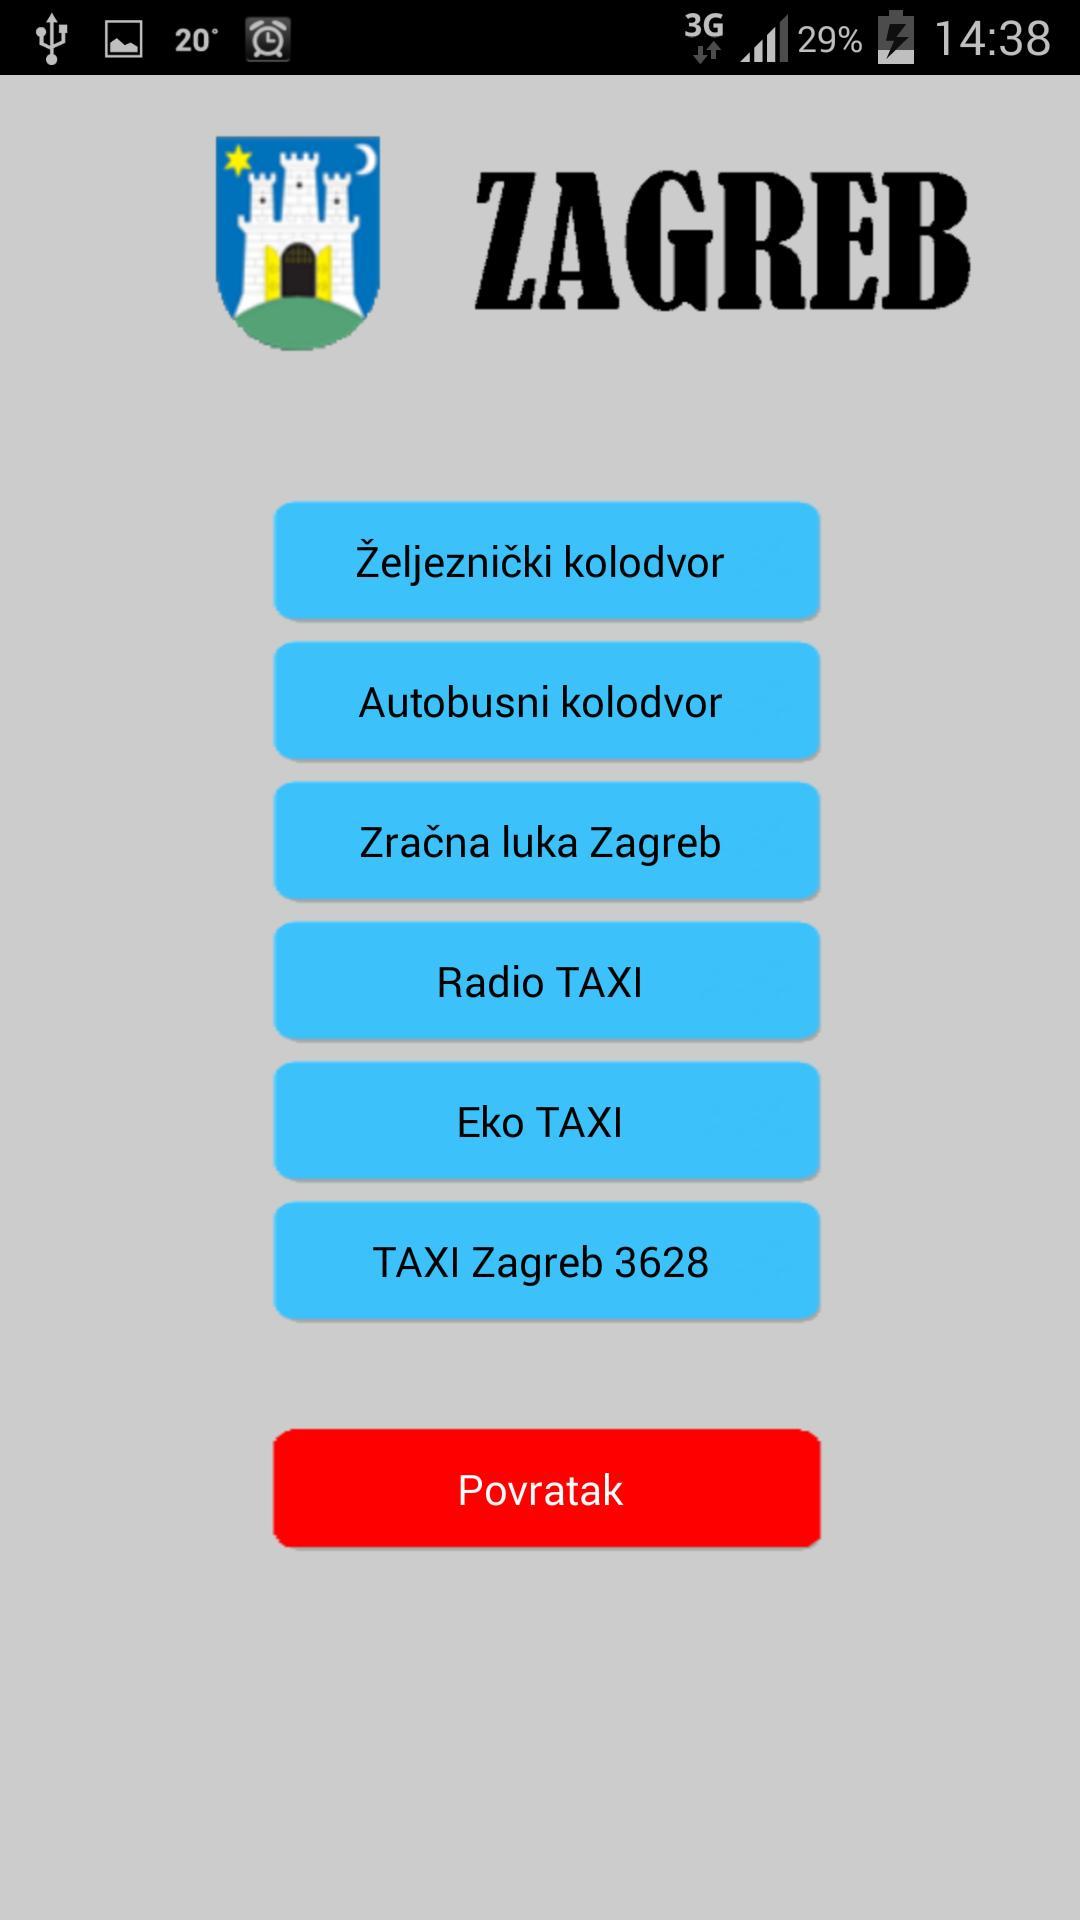 Hitni Brojevi U Rh For Android Apk Download